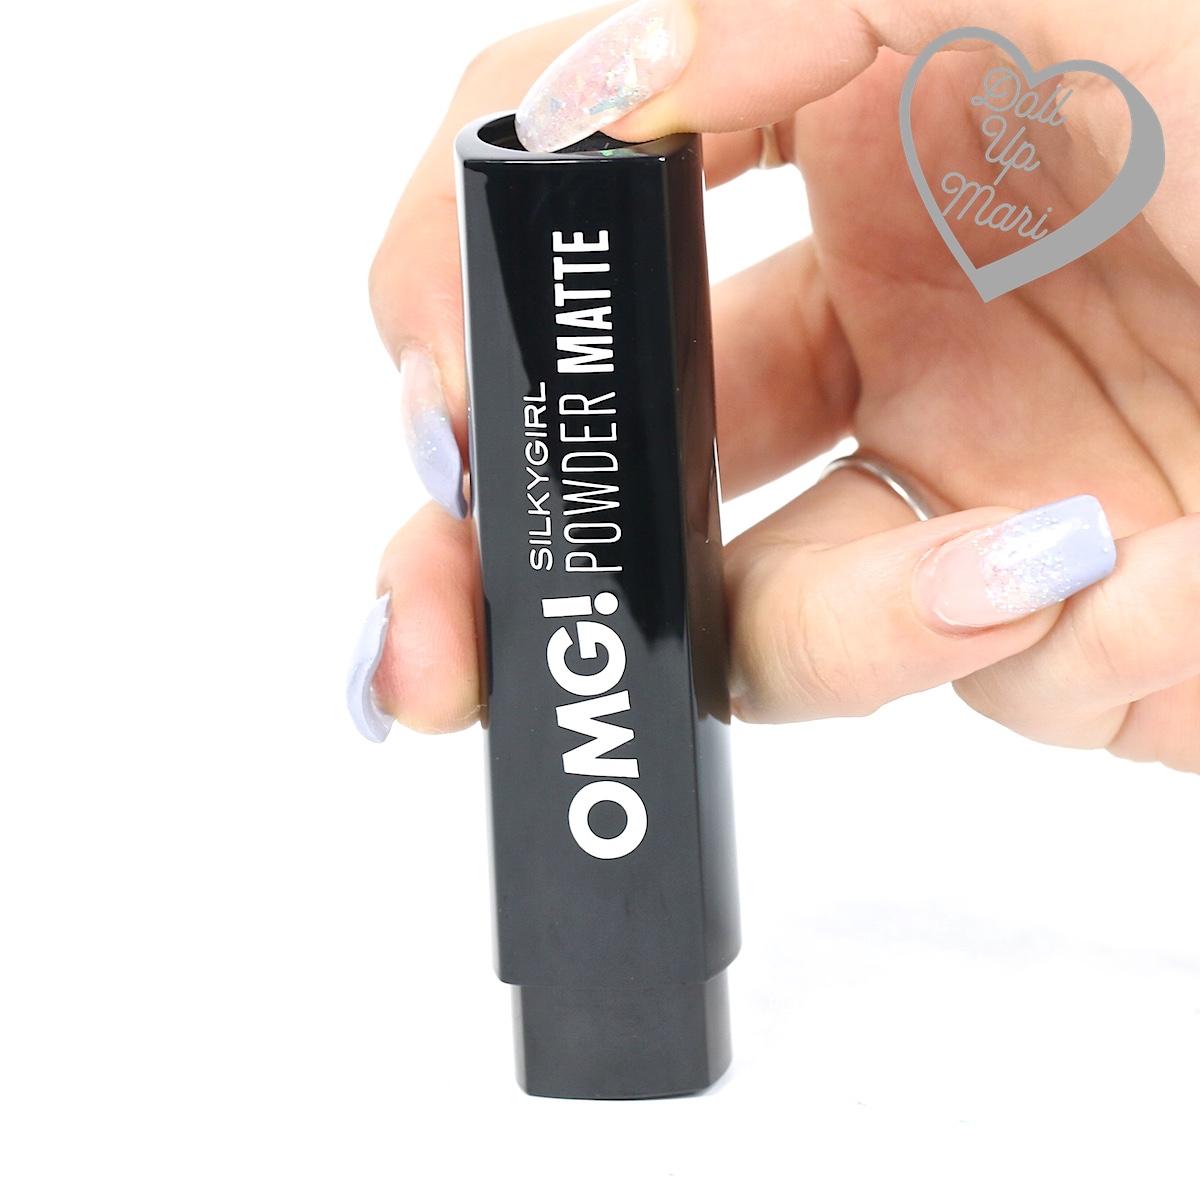 Silkygirl OMG! Powder Matte Lipcolor Lipstick casing when clicked